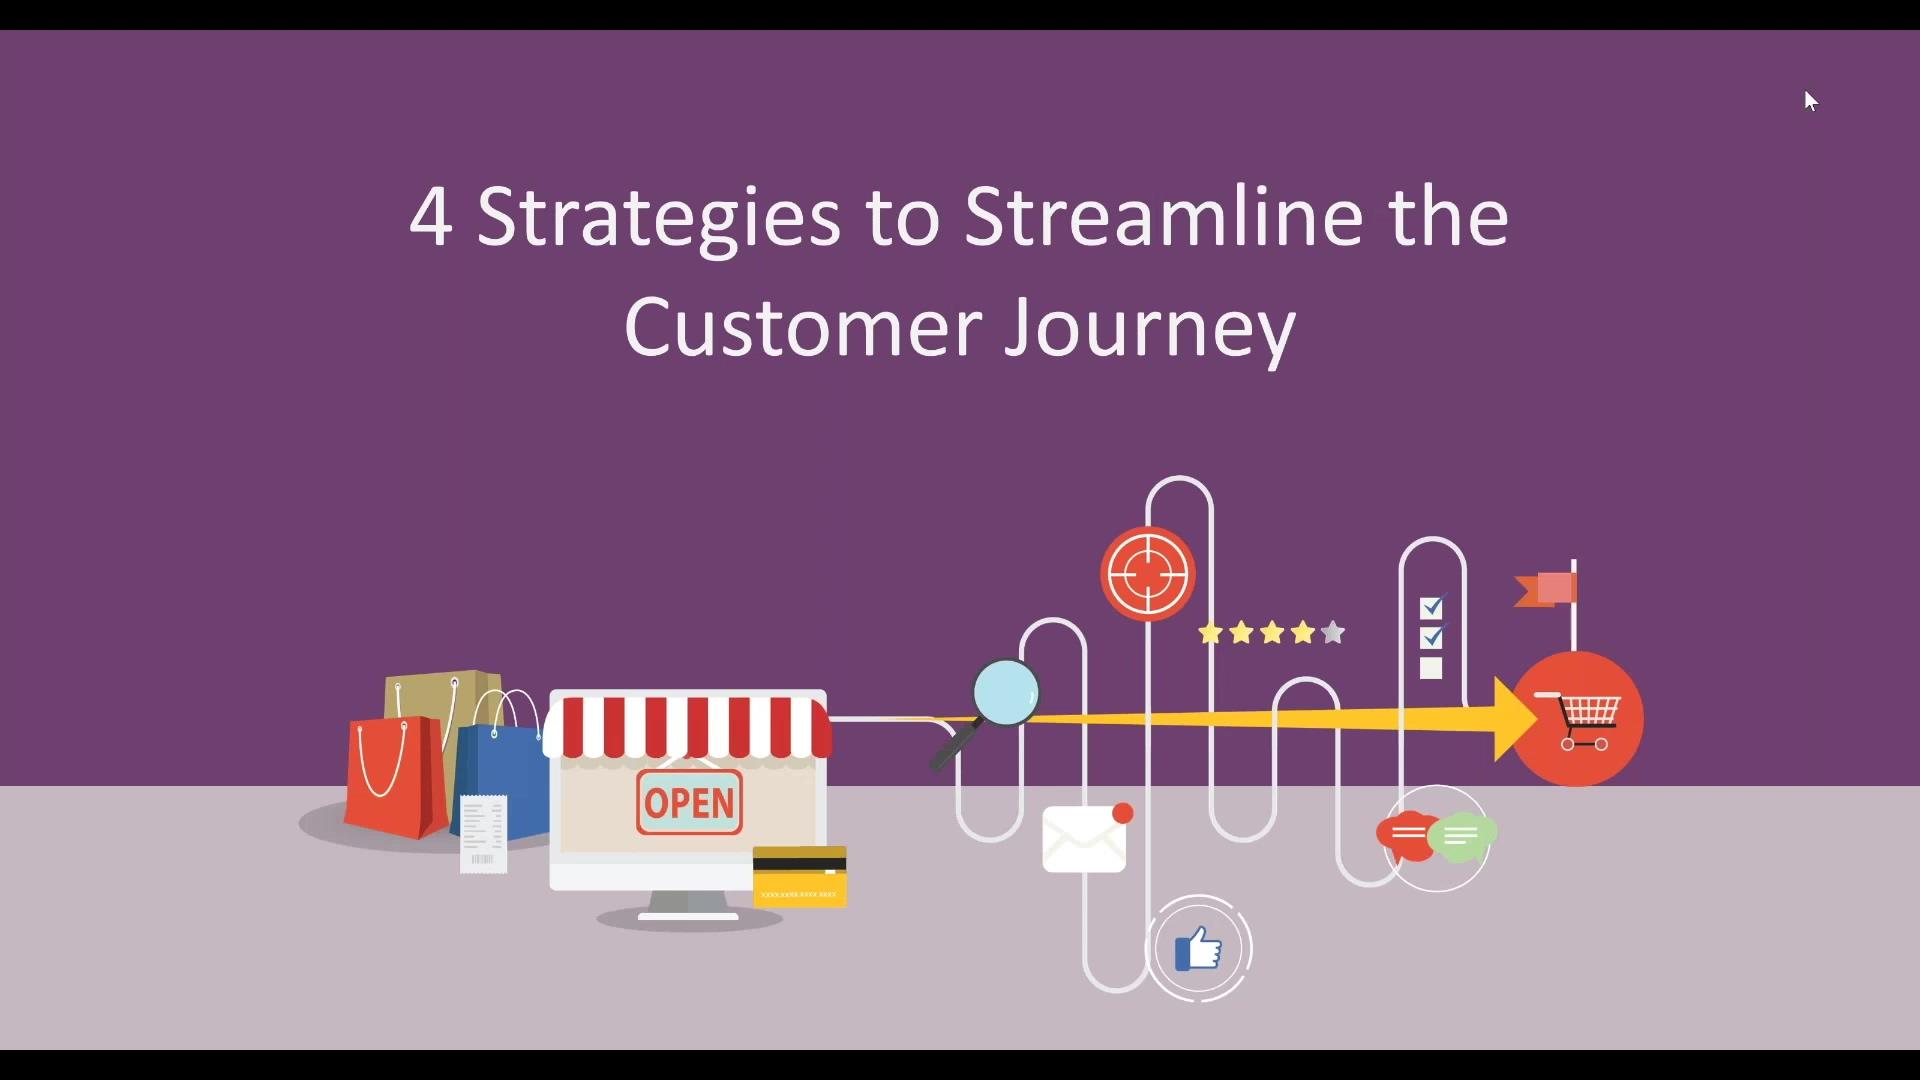 Webinar 4 strategies to streamline the customer journey-1